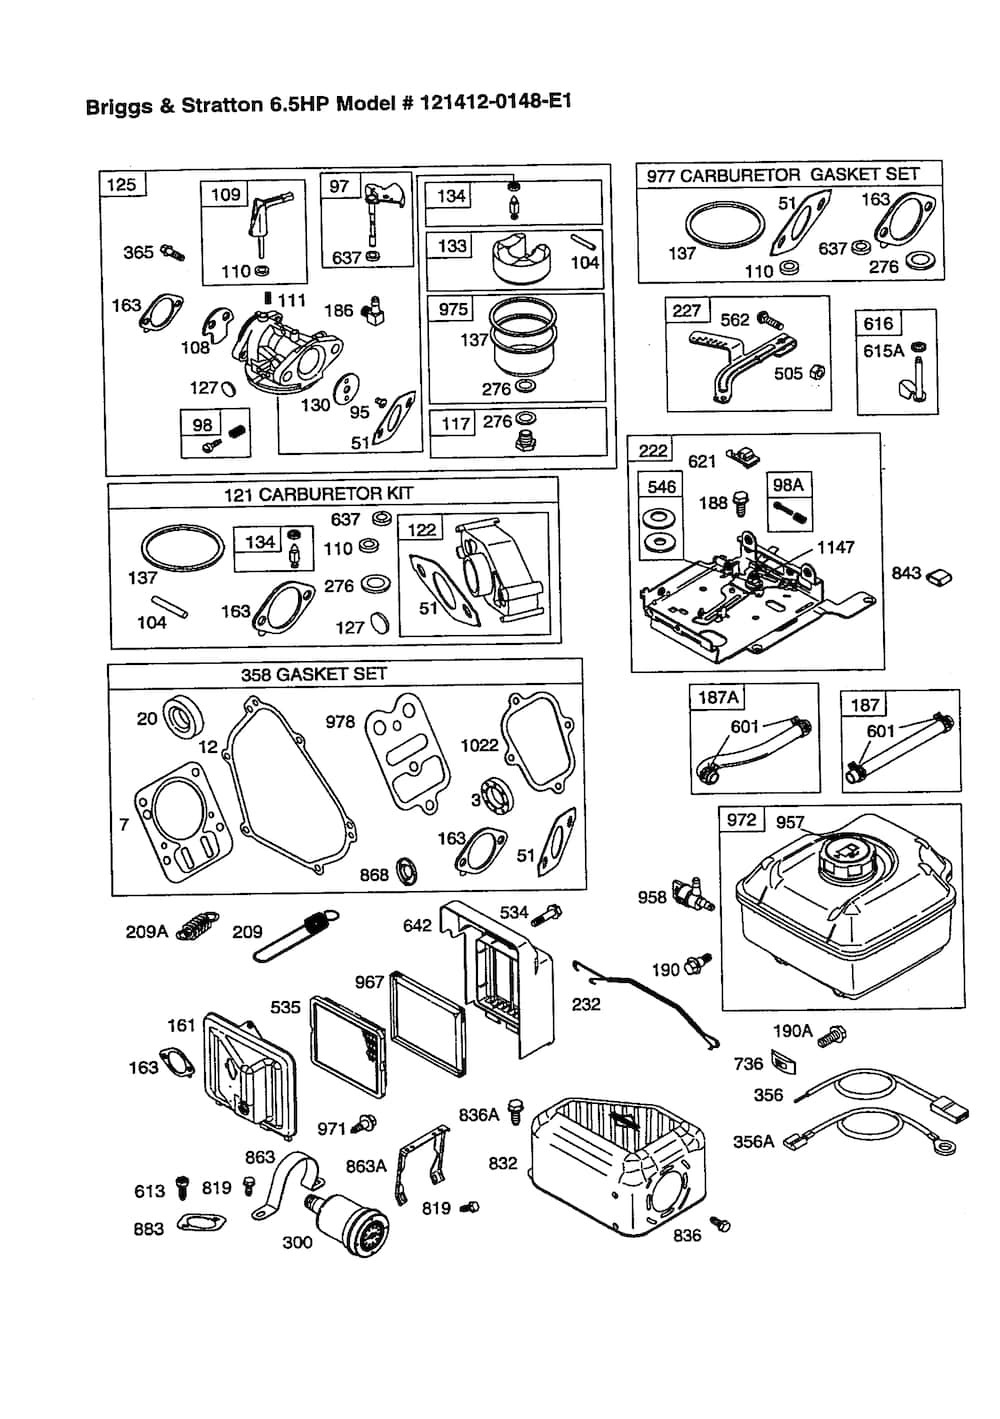 Diagram On Briggs Straton 6.5hp Engine Briggs and Stratton Carburetor Parts Diagram Of Diagram On Briggs Straton 6.5hp Engine